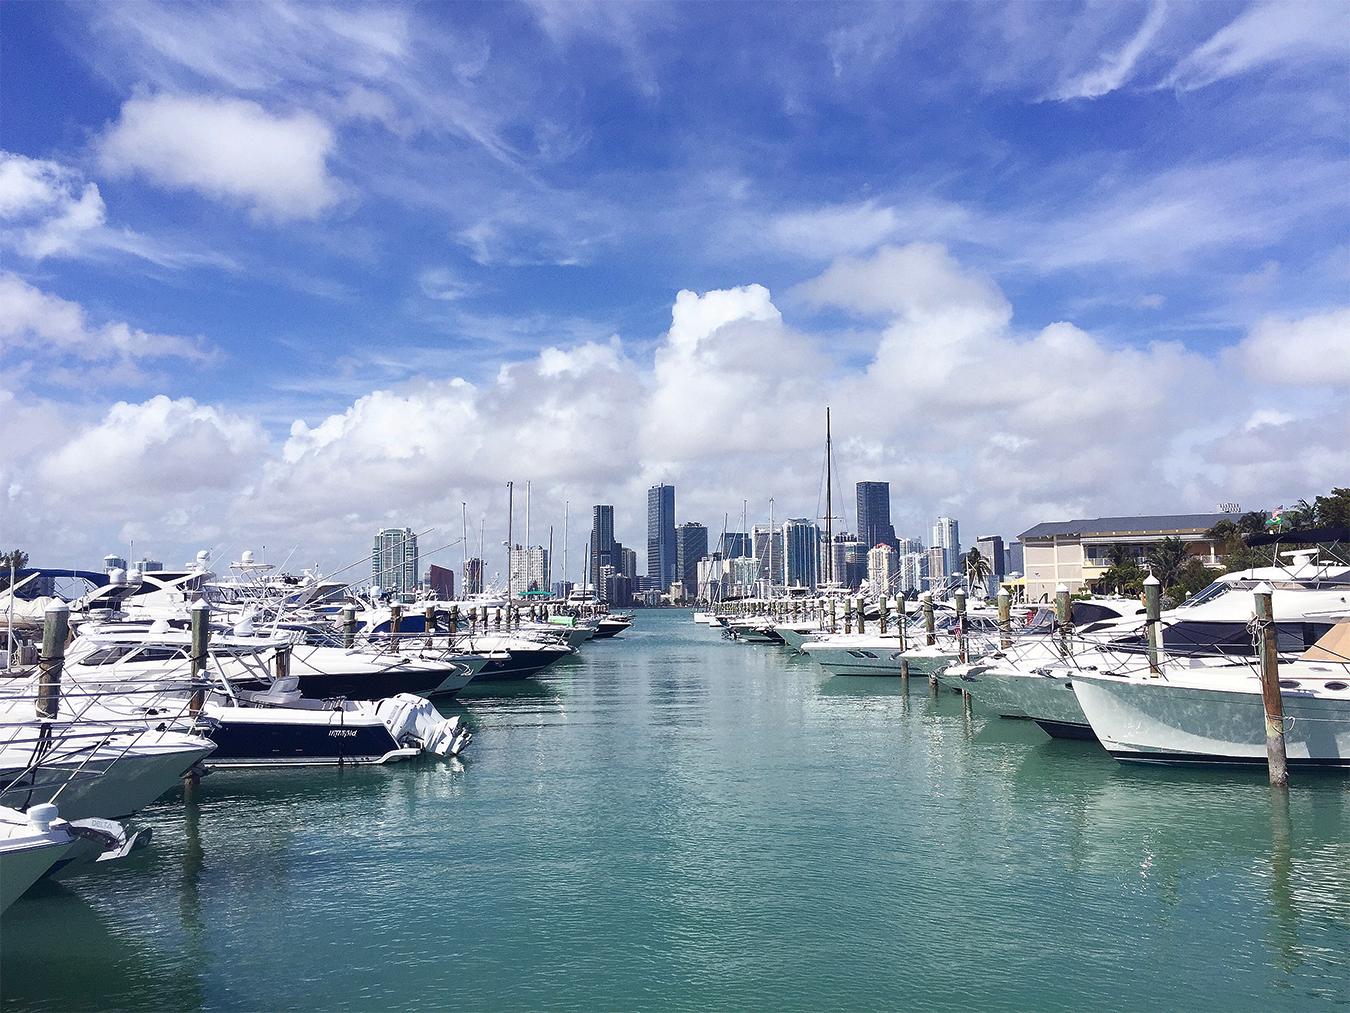 5_Mu_Qiao_travel_Photography_Miami_Key_West_Florida_boat_dock